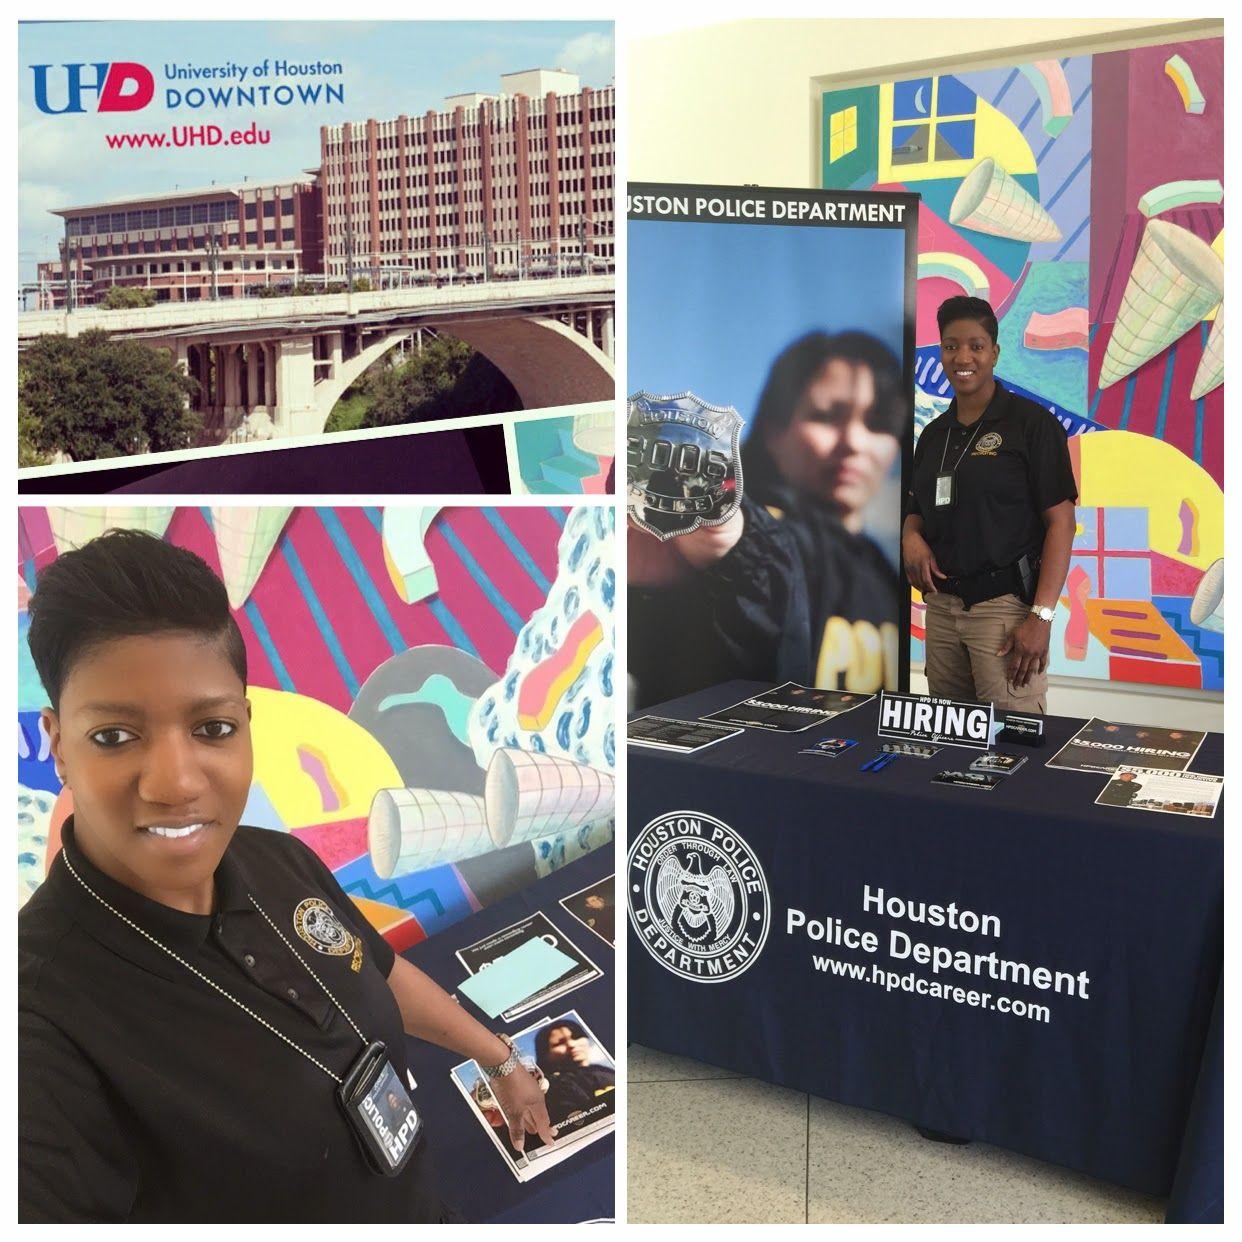 Houston Police Department _ at University of Houston